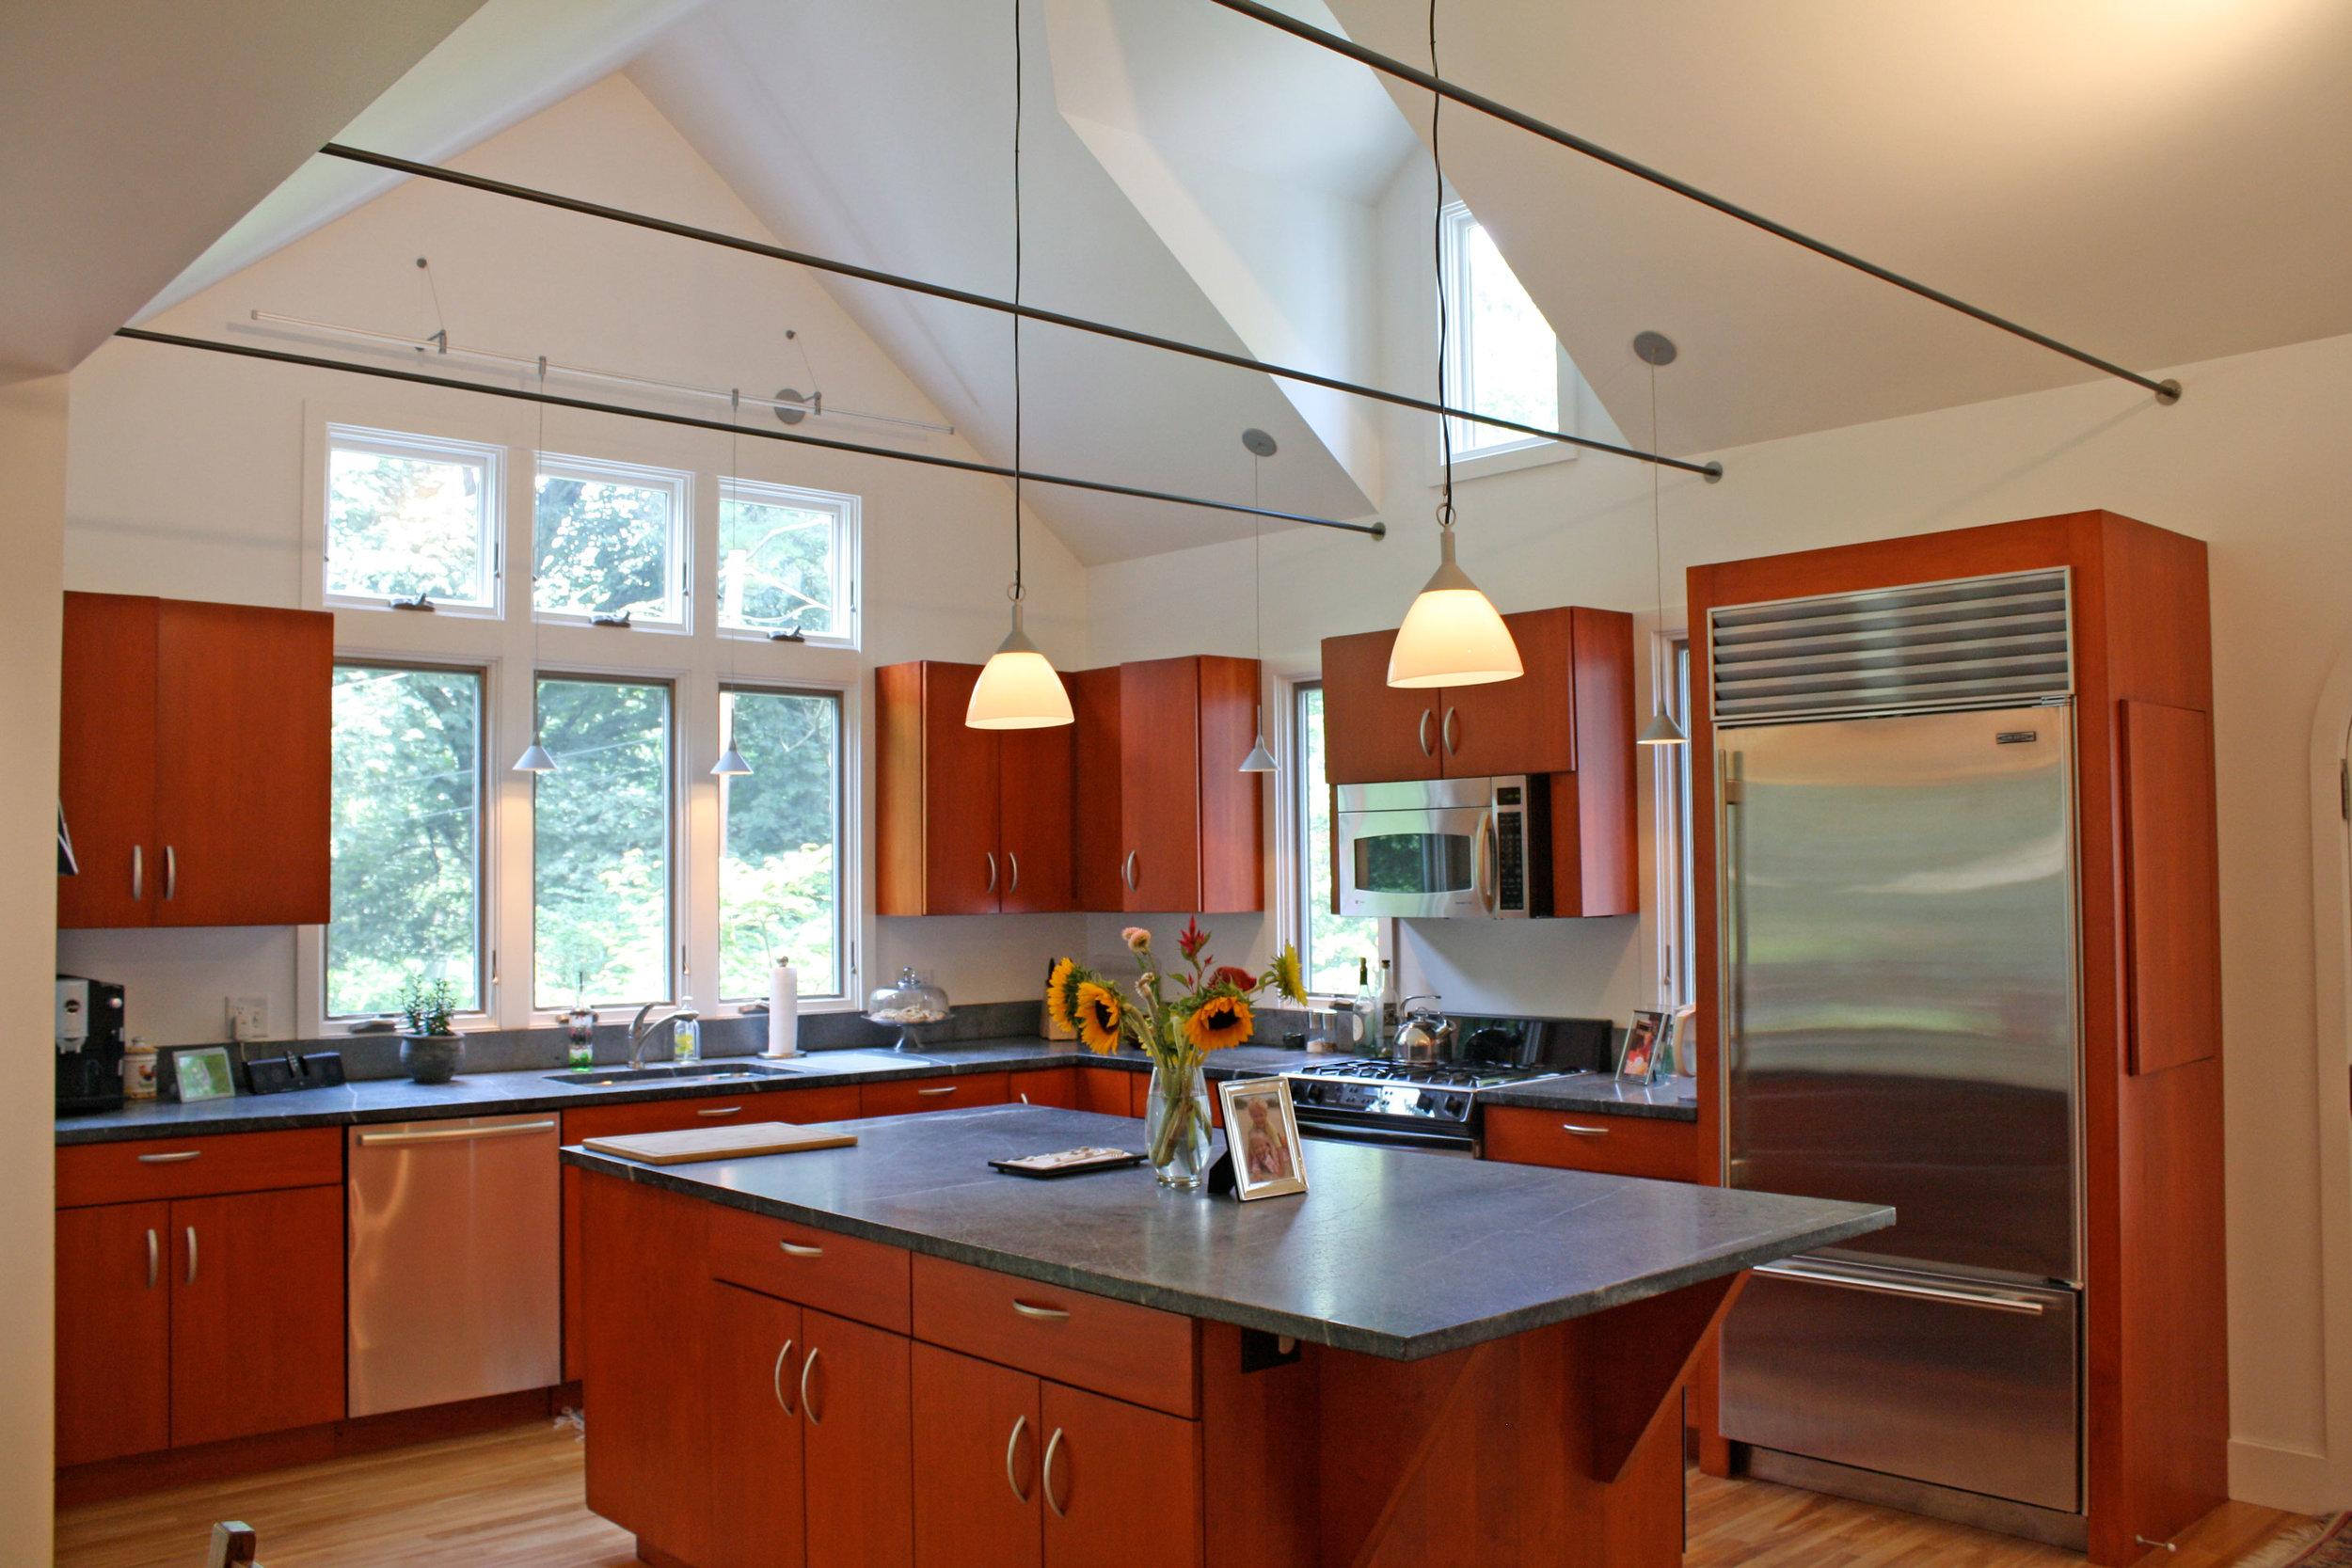 modern-kitchen-high-ceilings.jpg